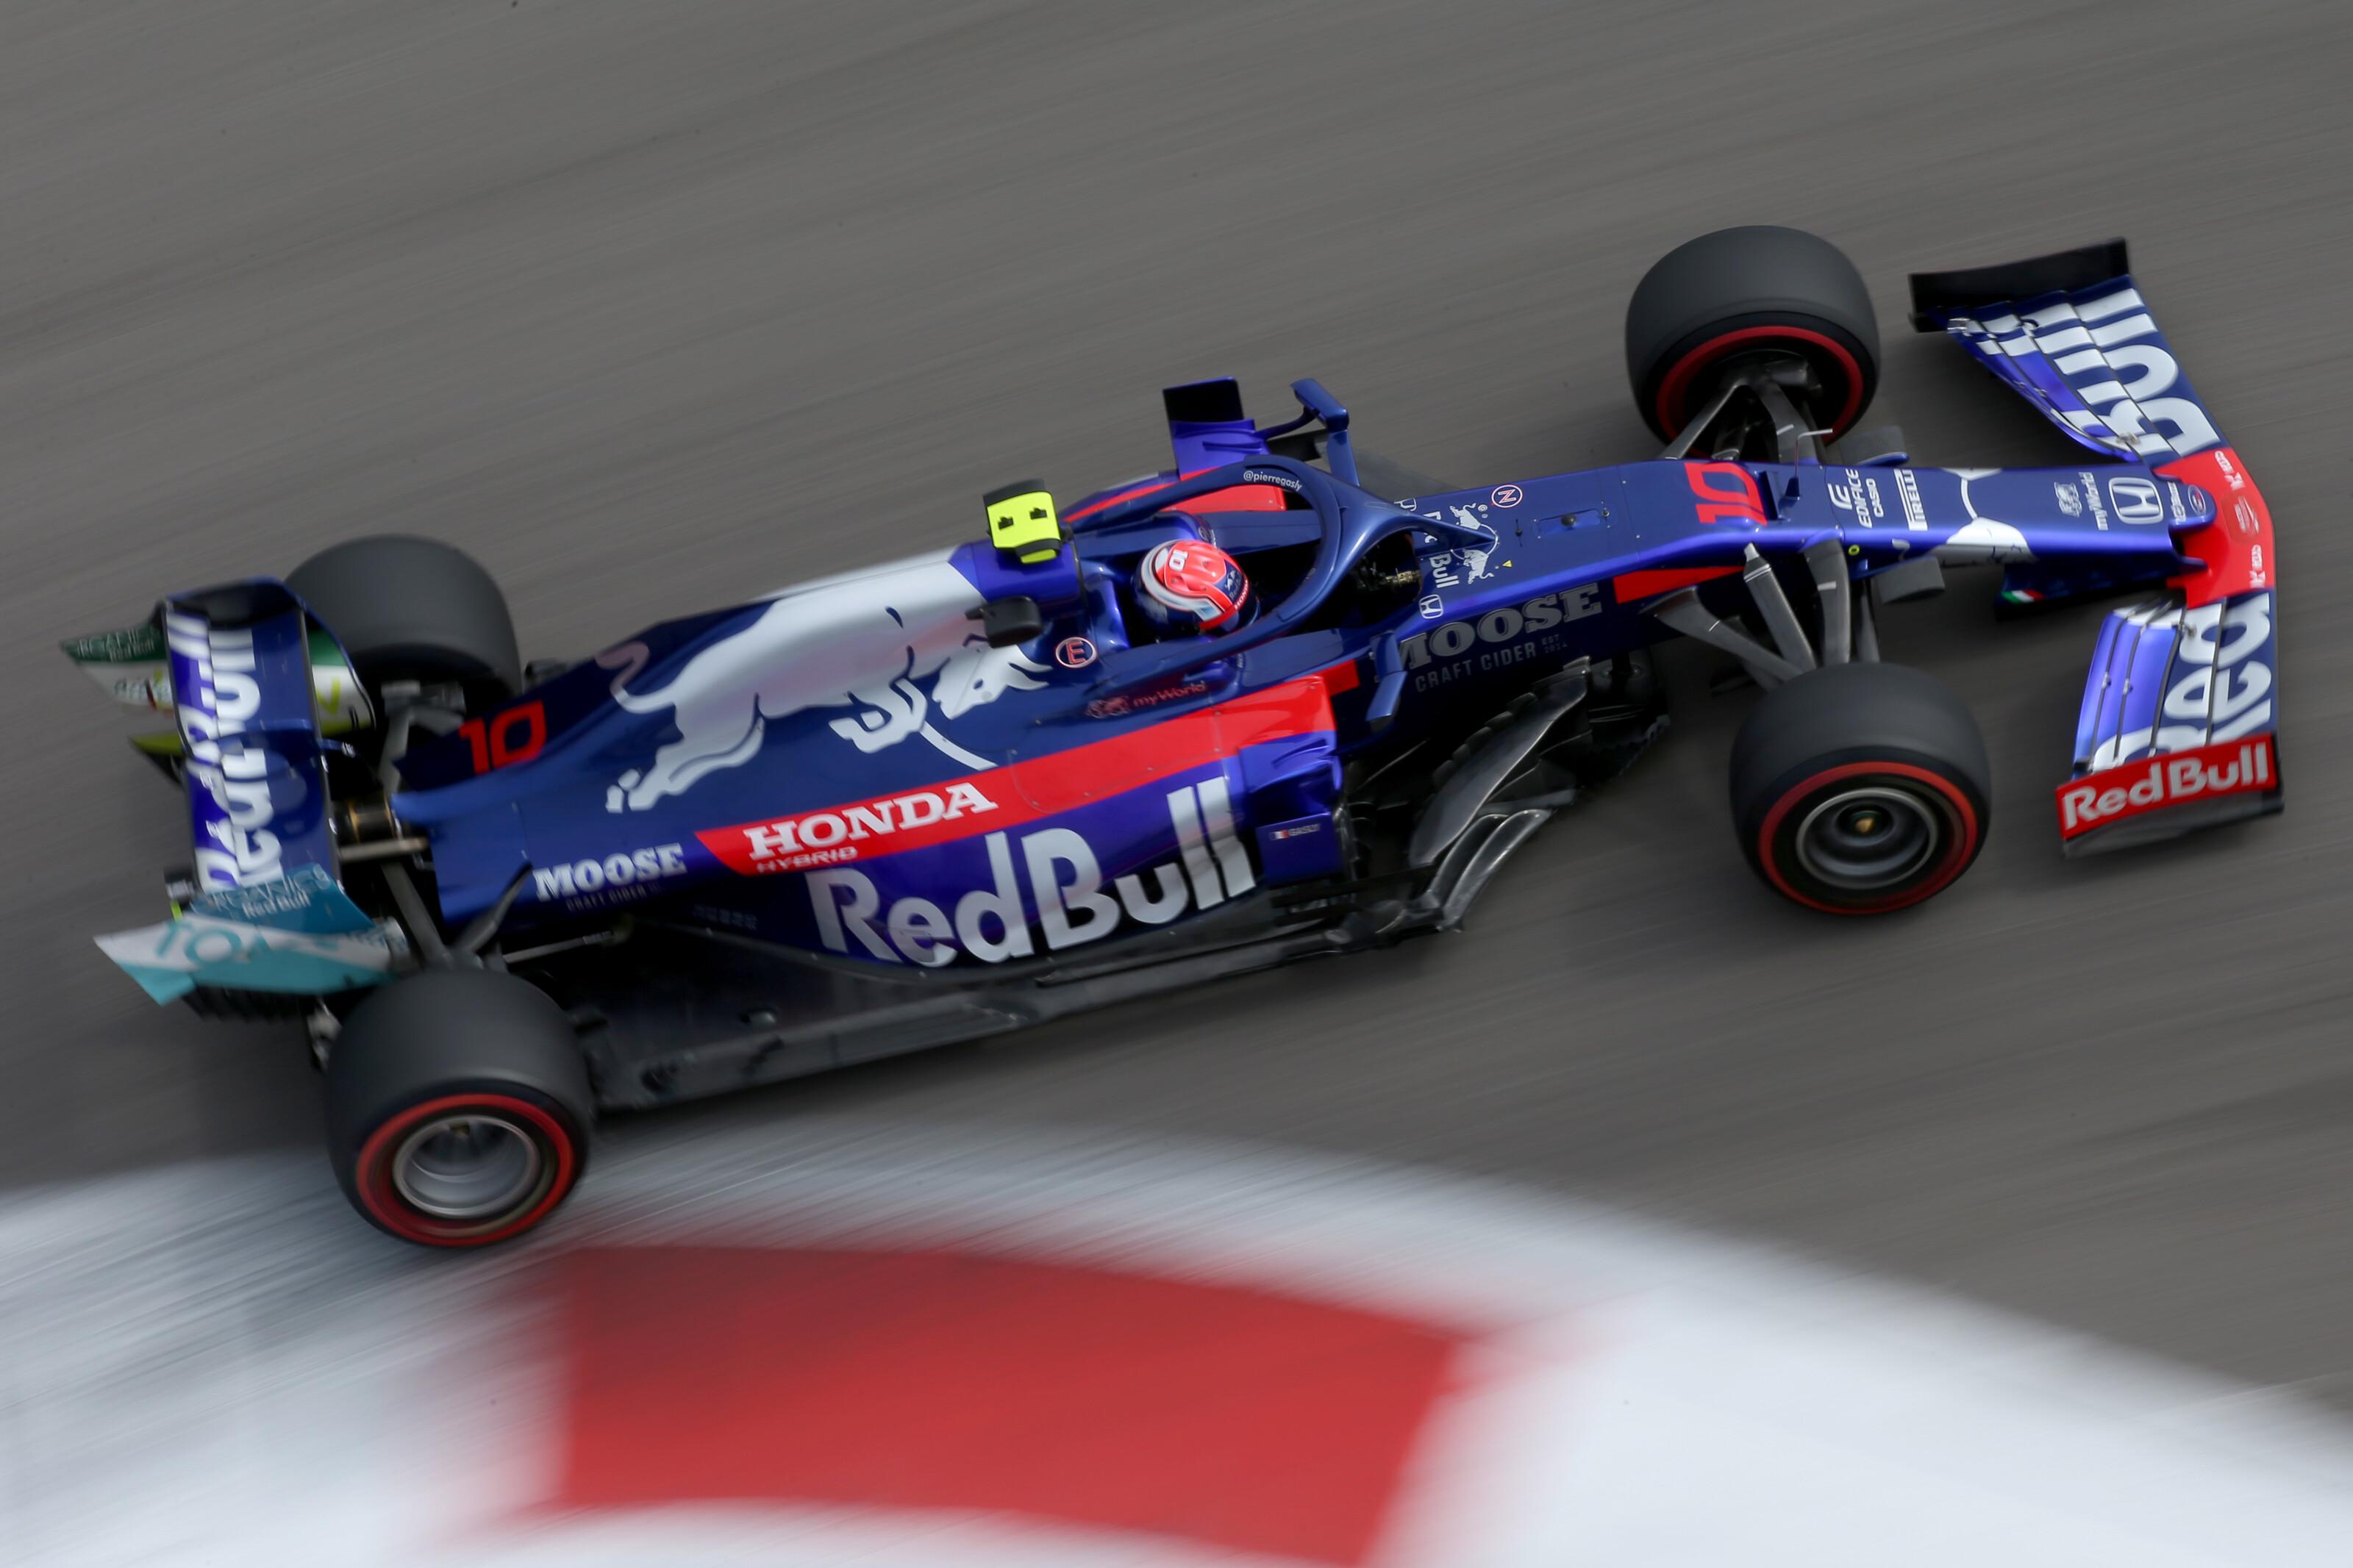 F1: Furcsa névre válthat a Toro Rosso